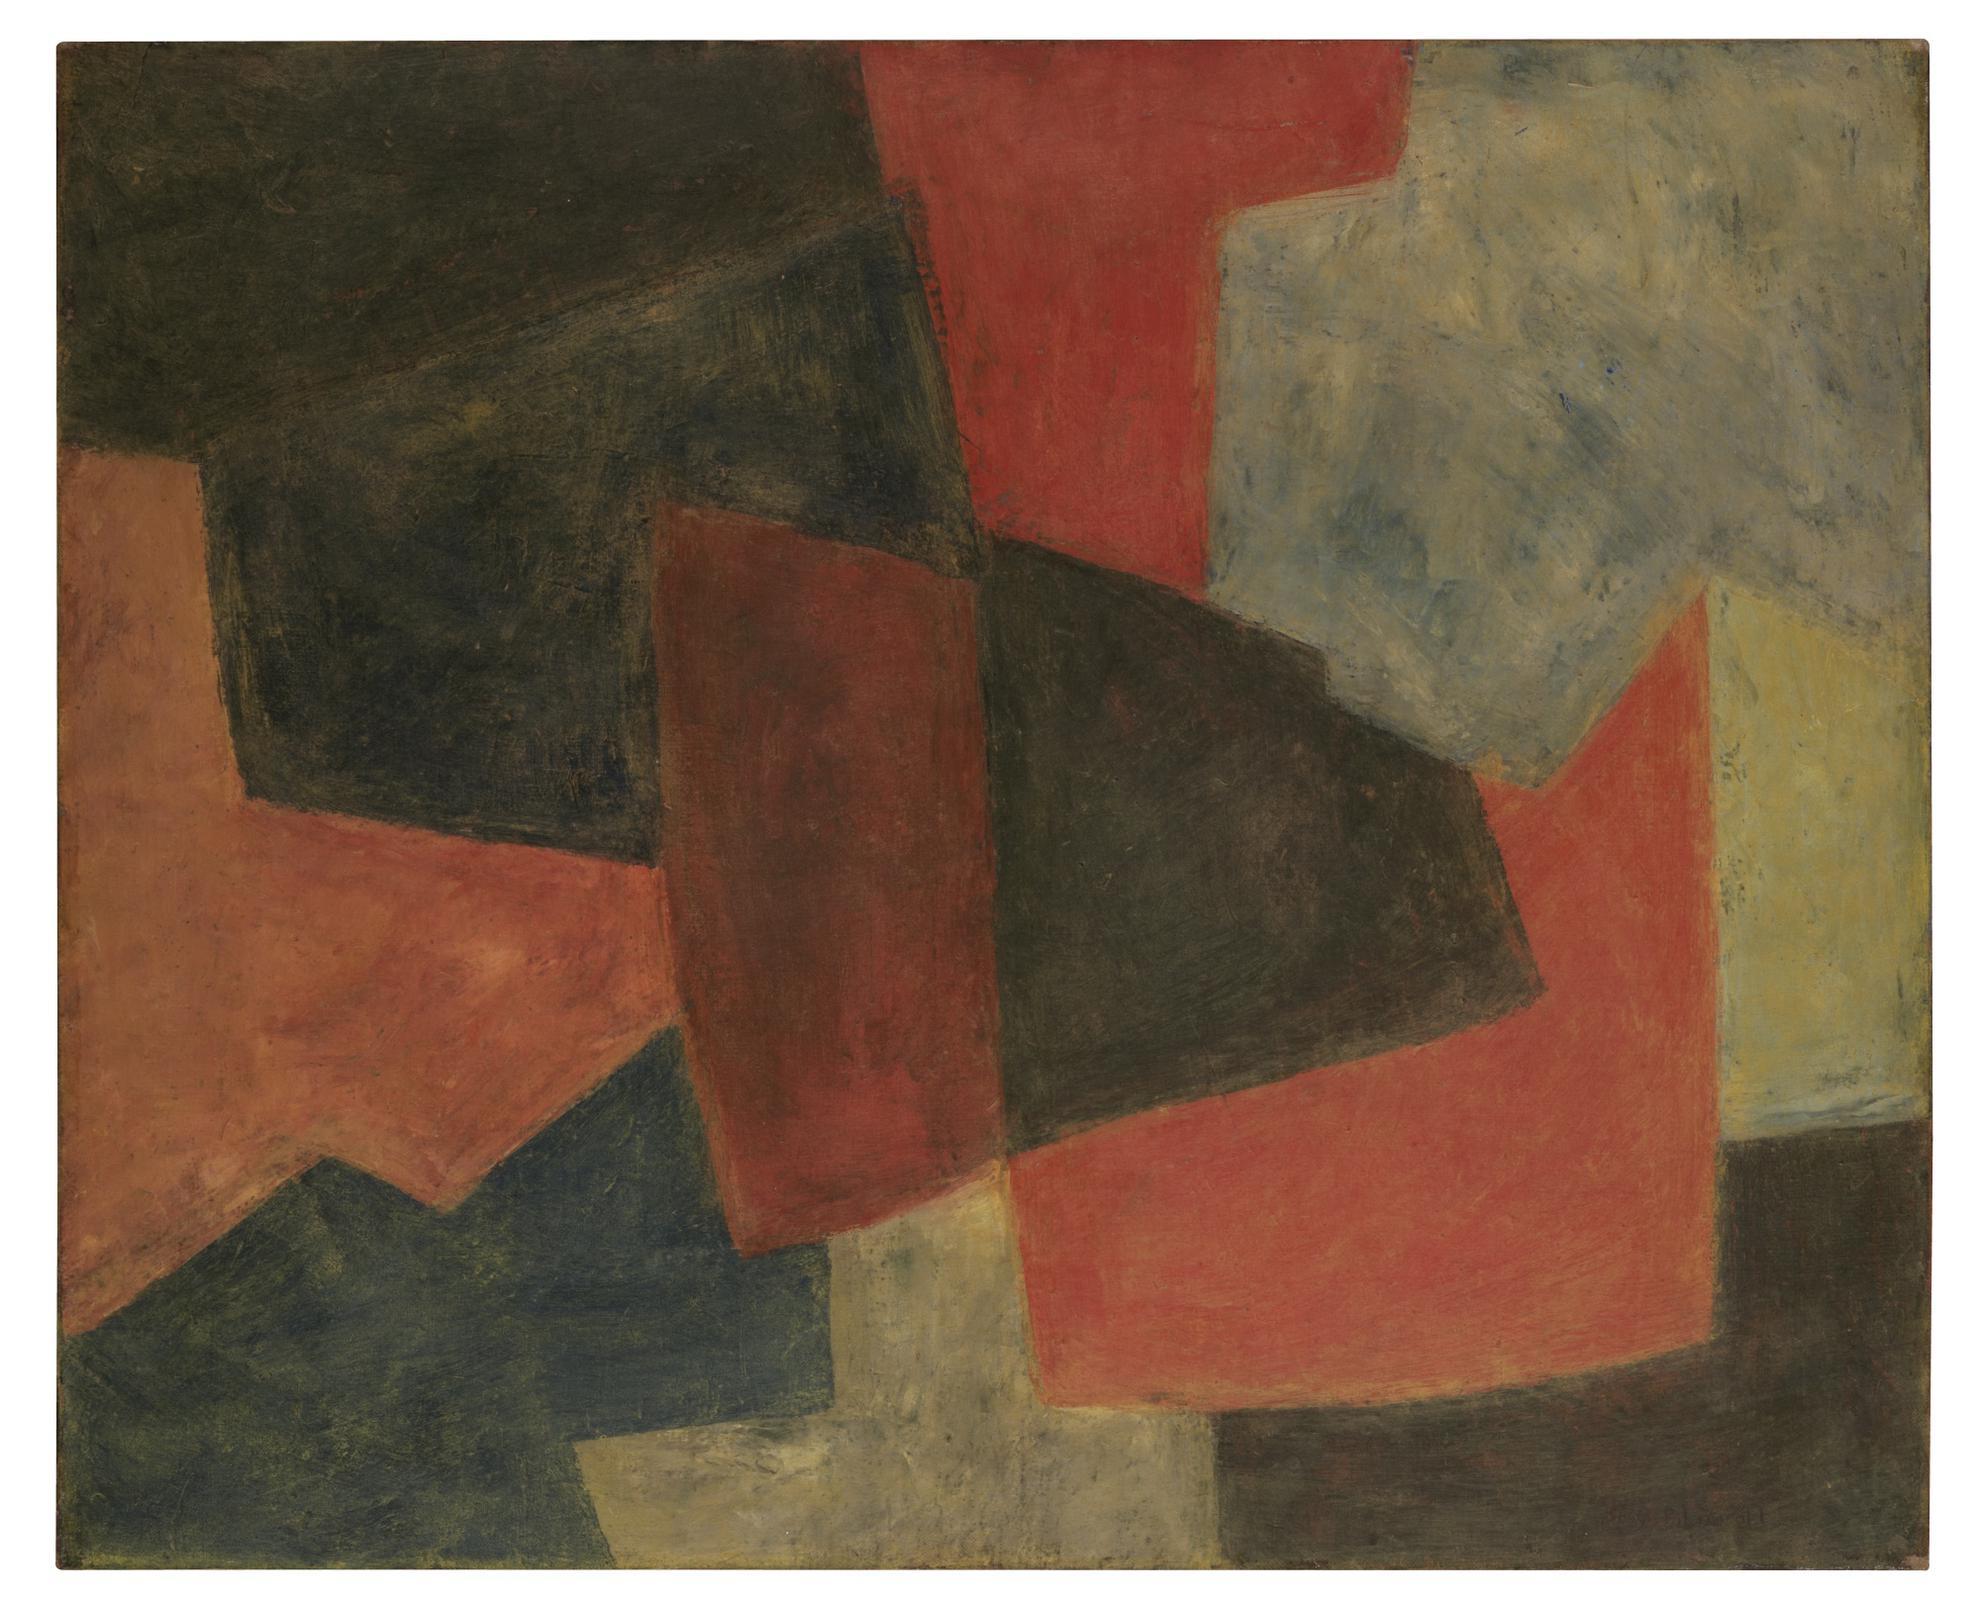 Serge Poliakoff-Composition Abstraite-1963